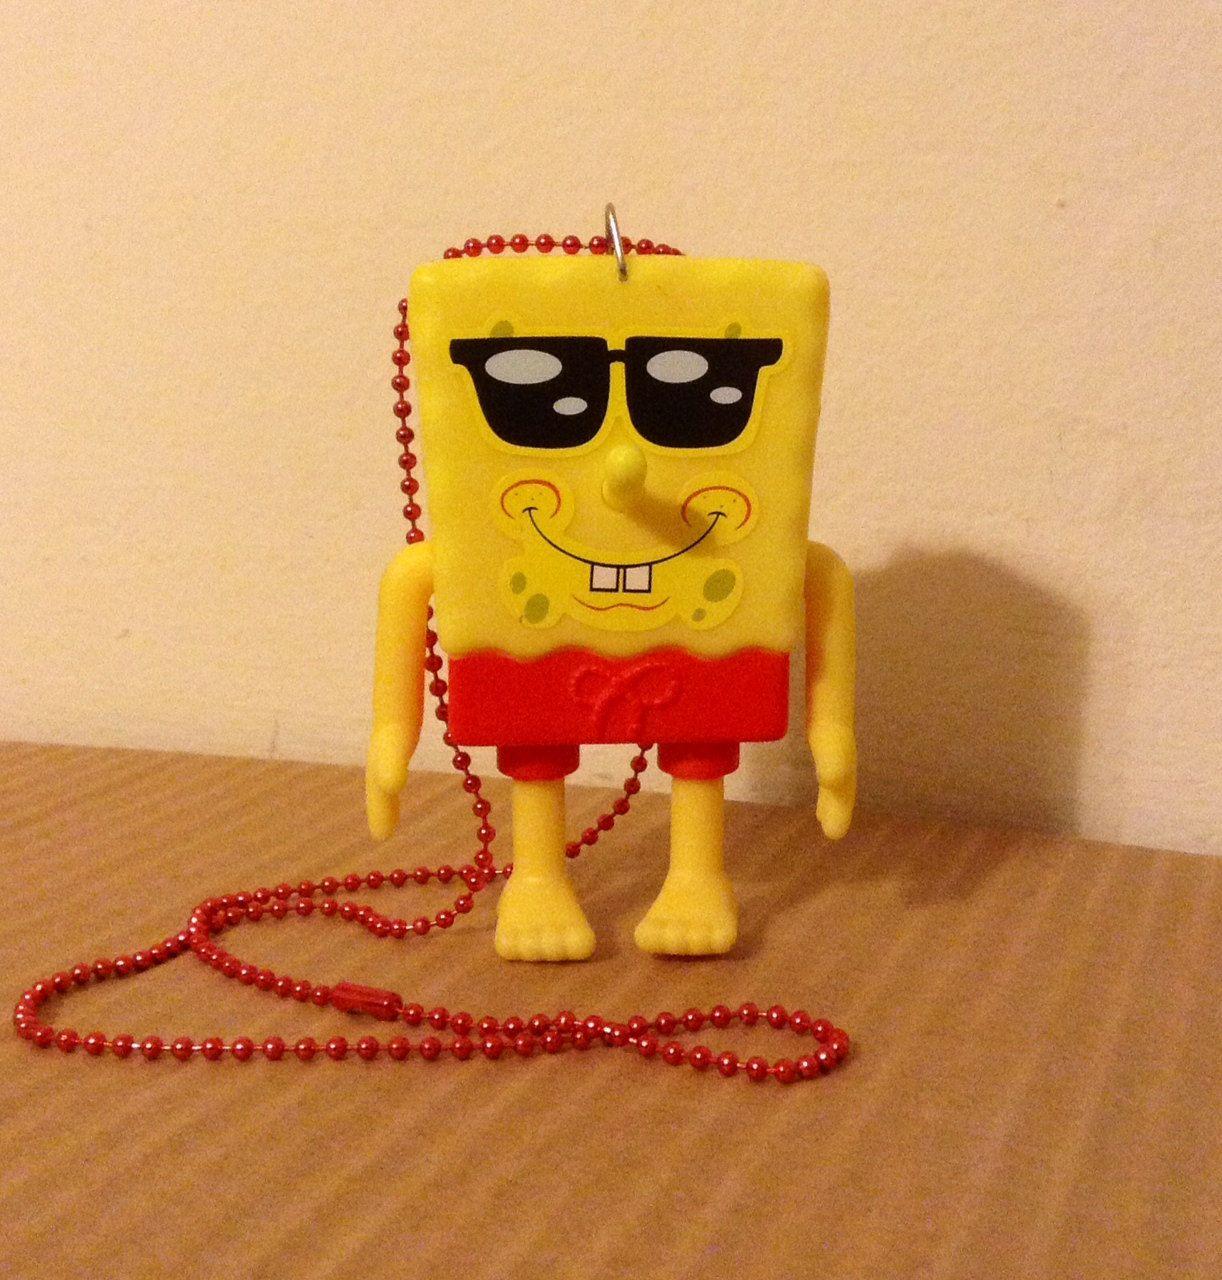 Lego Spongebob Squarepants Gary the Snail Pink Shell Minifigure Figure 3818 3834